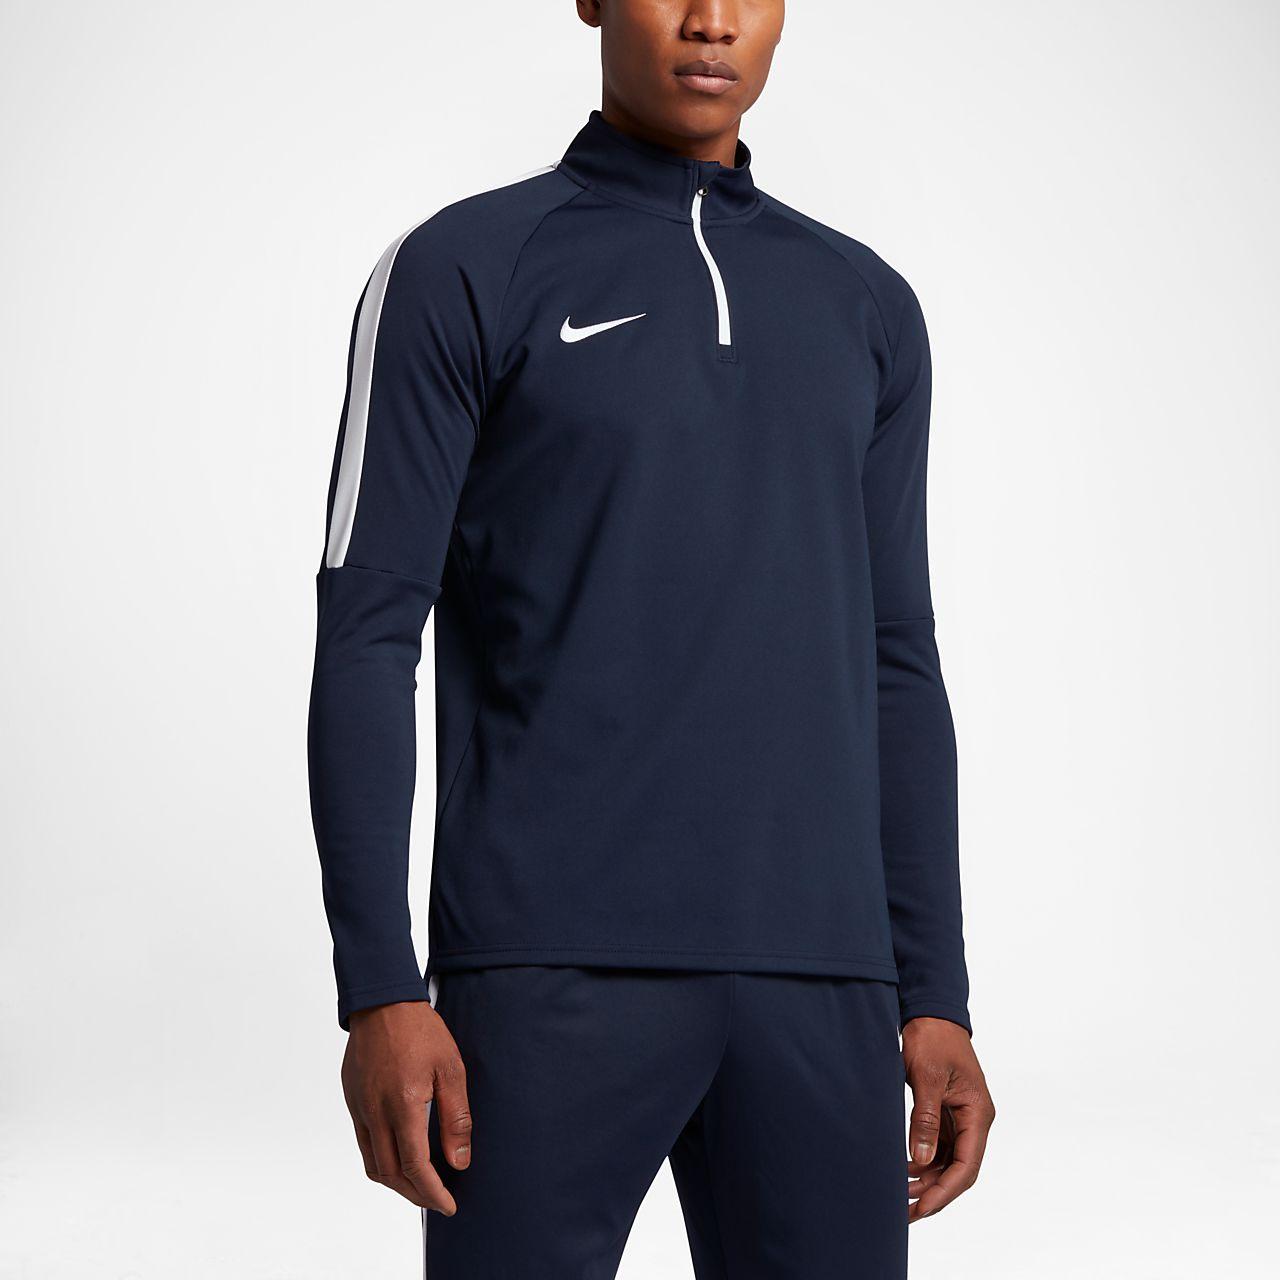 a6b0da5b4 ... Męska treningowa koszulka piłkarska z zamkiem 1/4 Nike Dri-FIT Academy